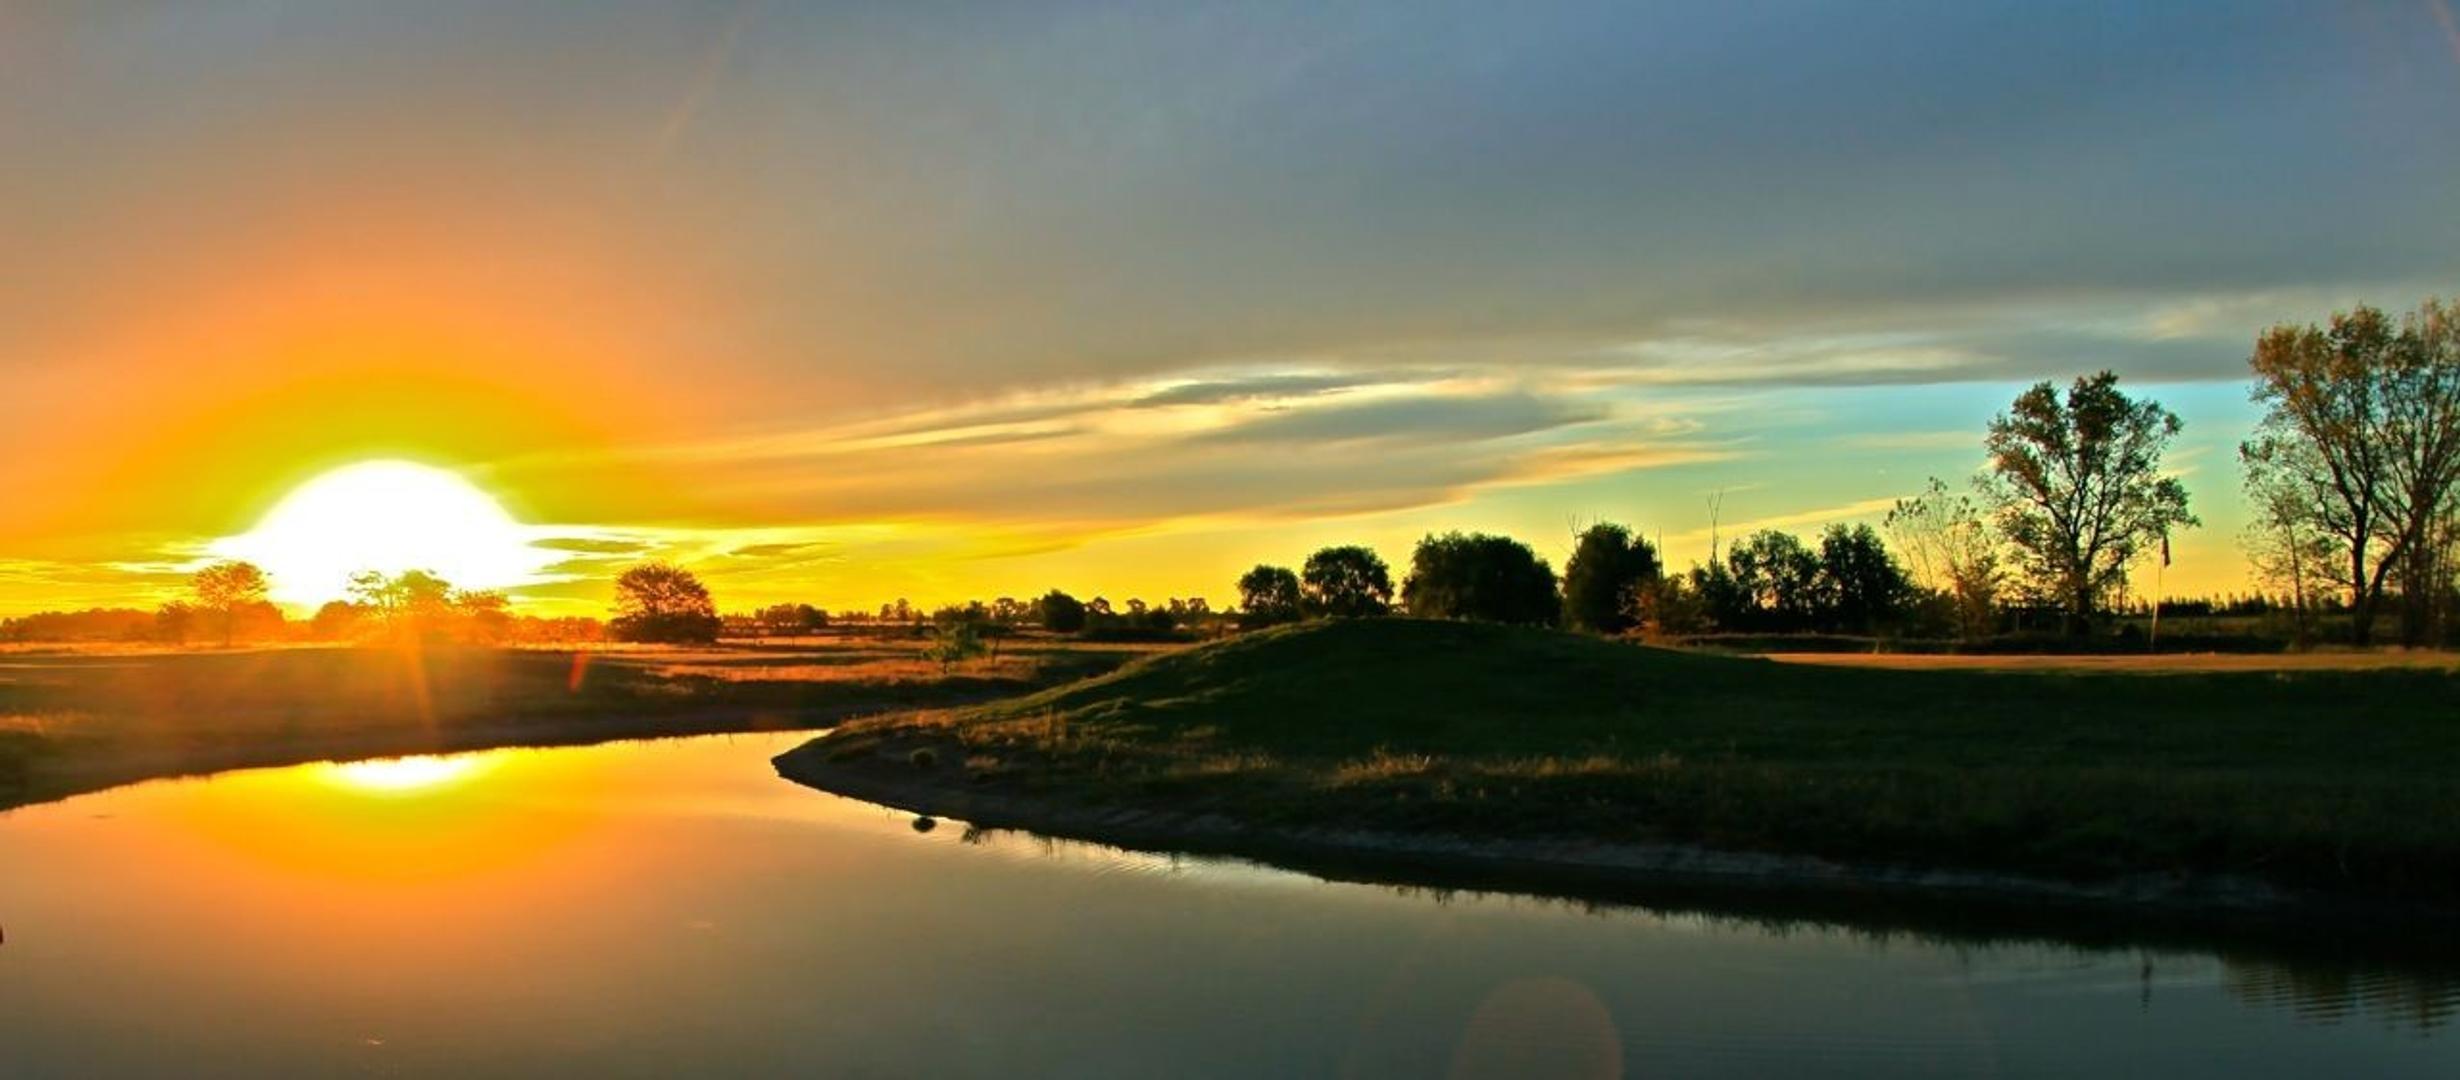 Tizado Pilar vende lotes al golf en Medal CC, Pilar y Alrededores - PIL3849_LP172623_1